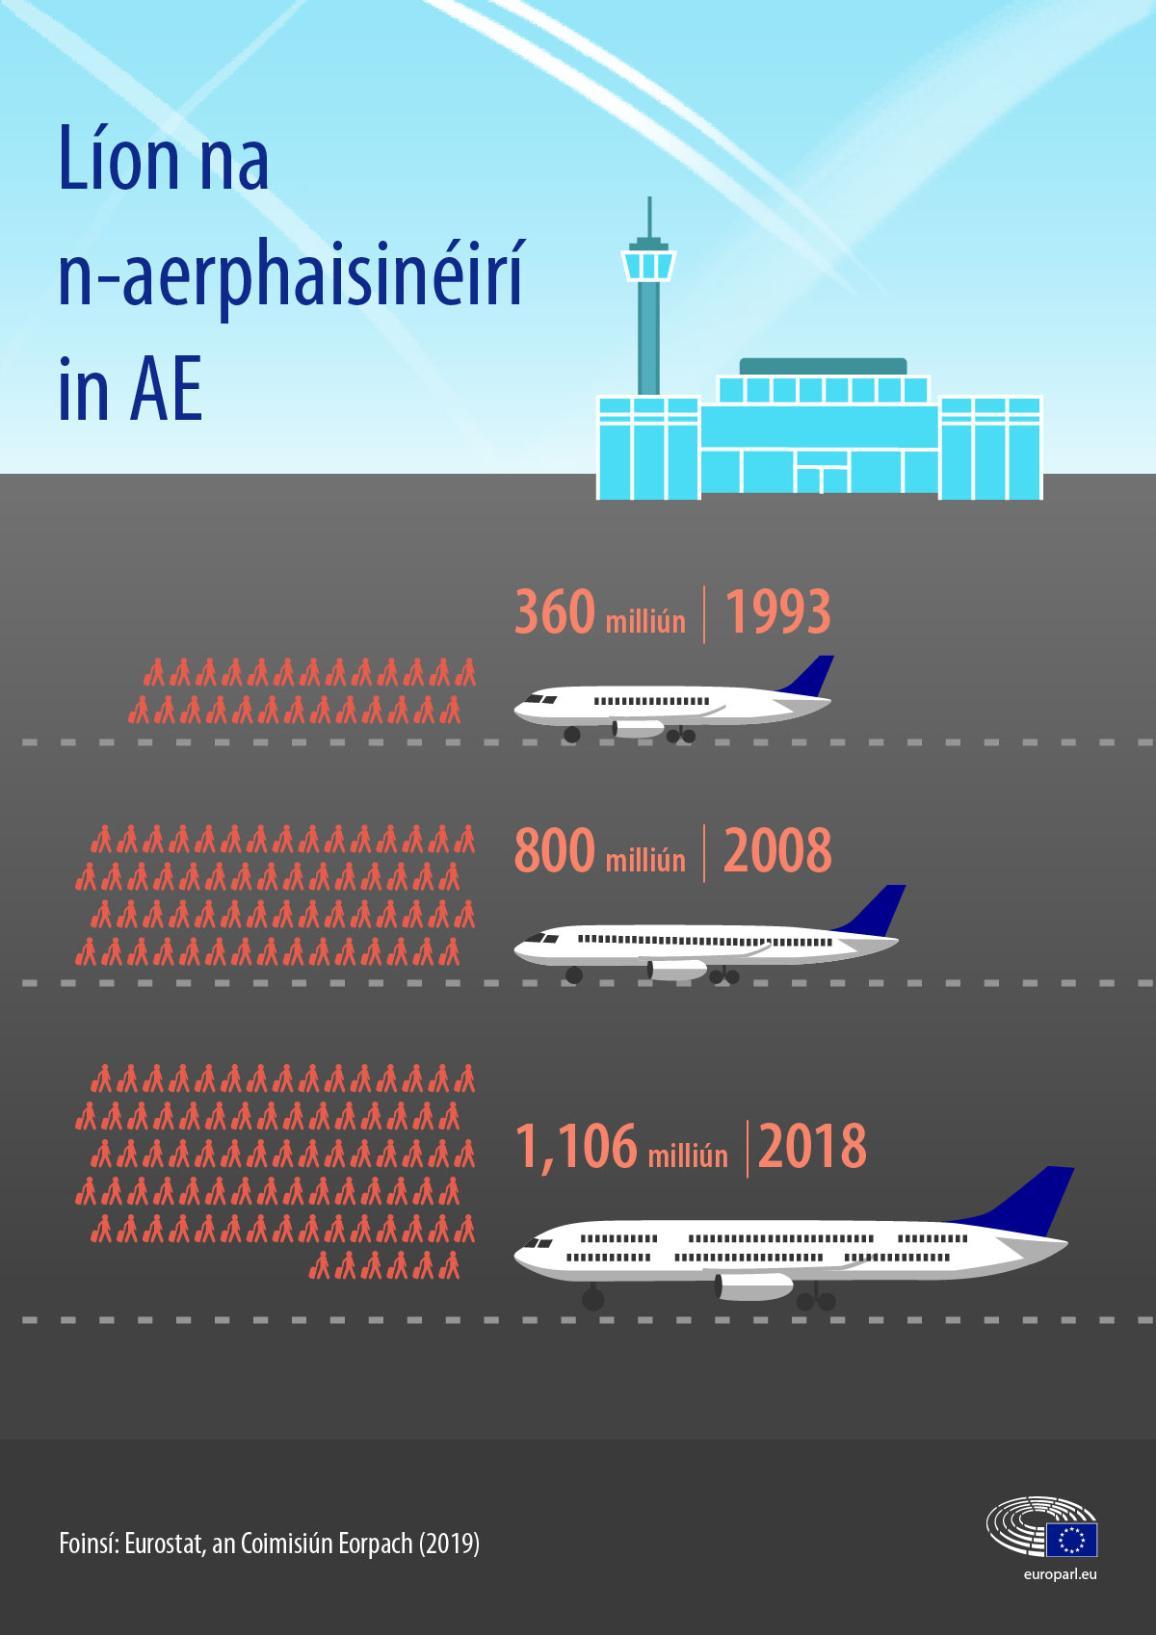 Number of air passengers in de EU